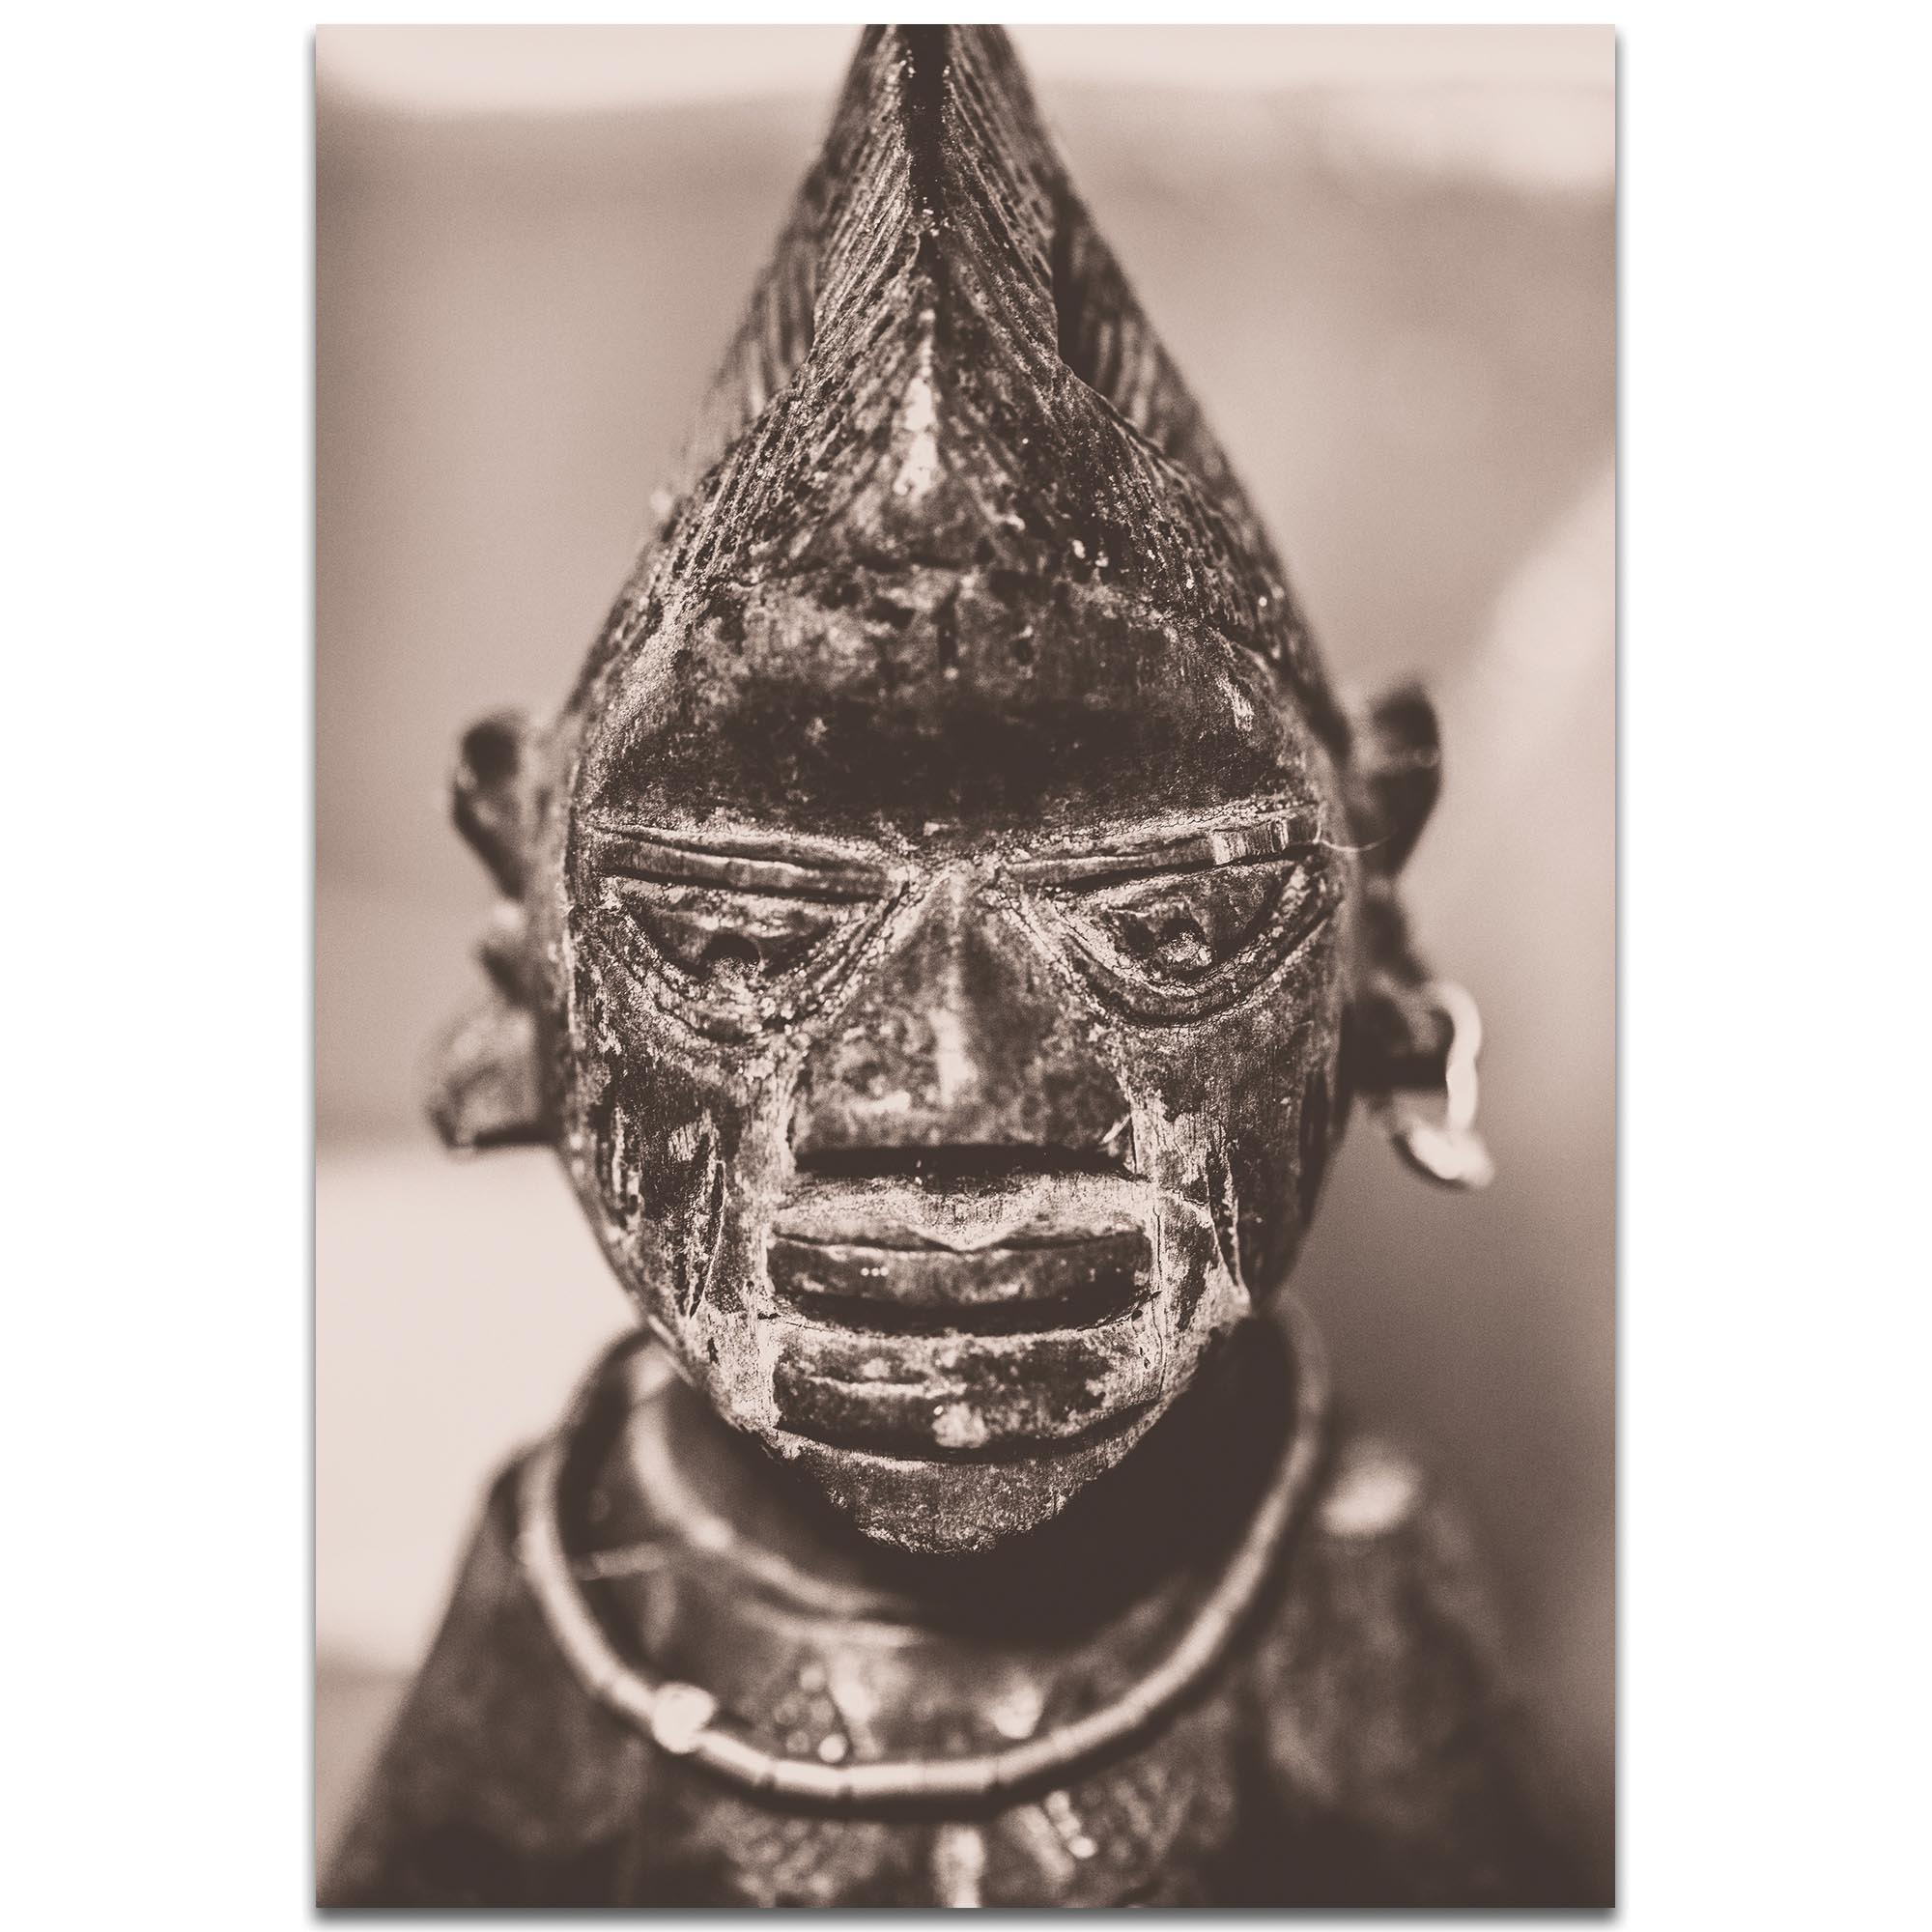 Eclectic Wall Art 'Voodoo Statue' - Religion Decor on Metal or Plexiglass